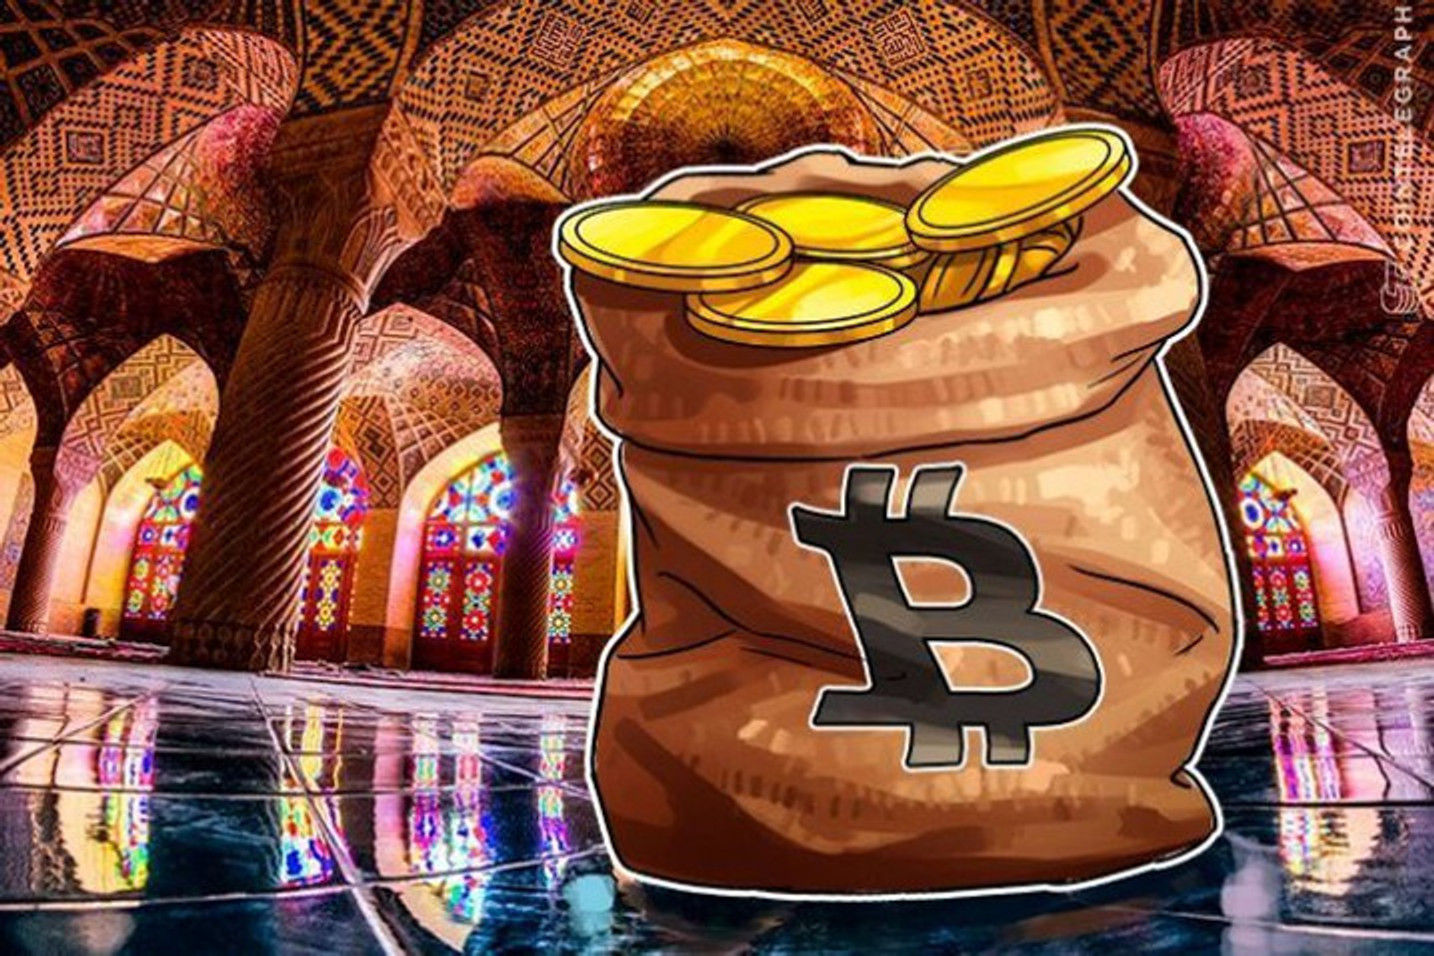 Ministério Publico Federal participará de evento promovido pela Interpol sobre crimes com Bitcoin